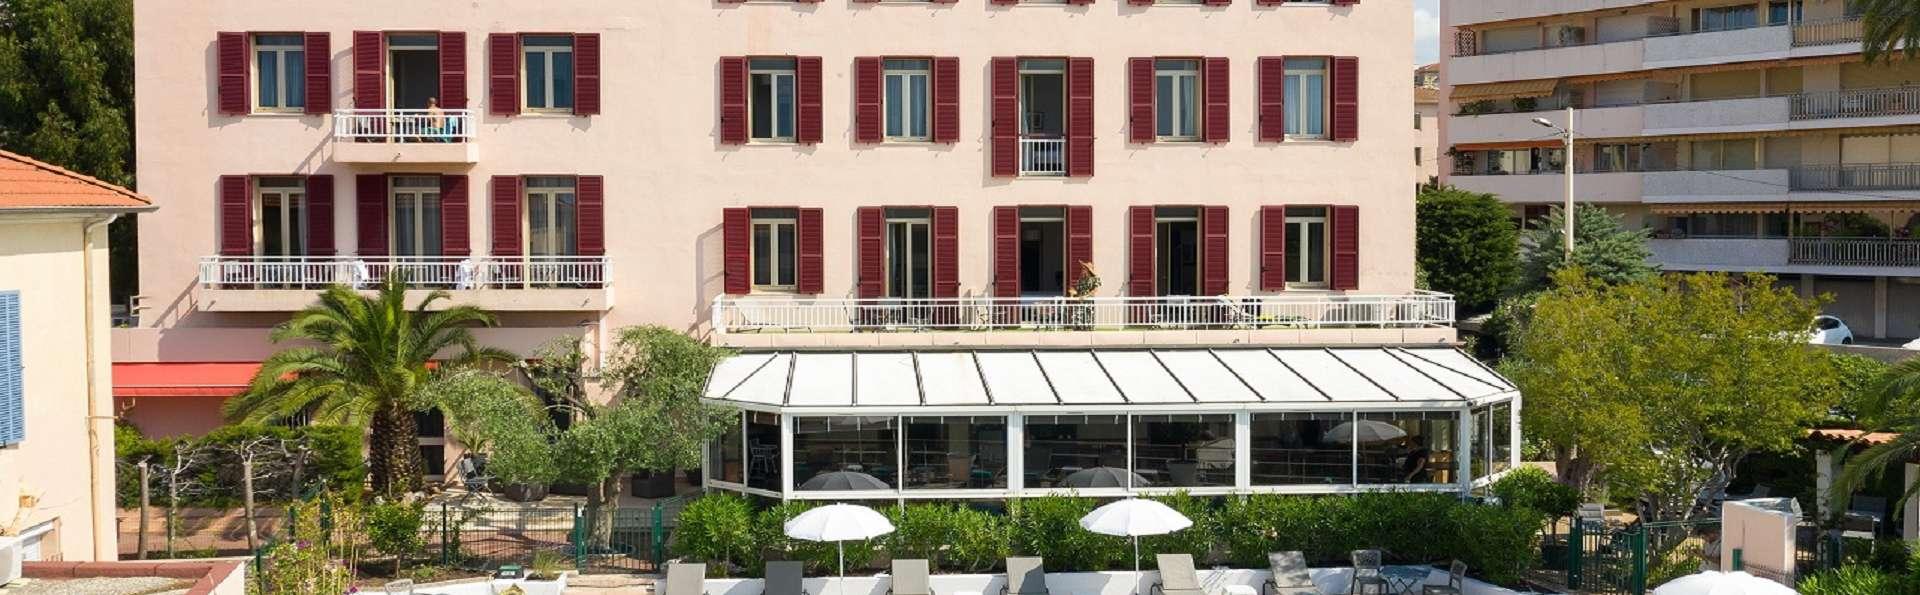 The Originals Boutique, Hôtel des Orangers, Cannes (Inter-Hotel) - i-Orangers_06-2020_HD-010_BD.jpg